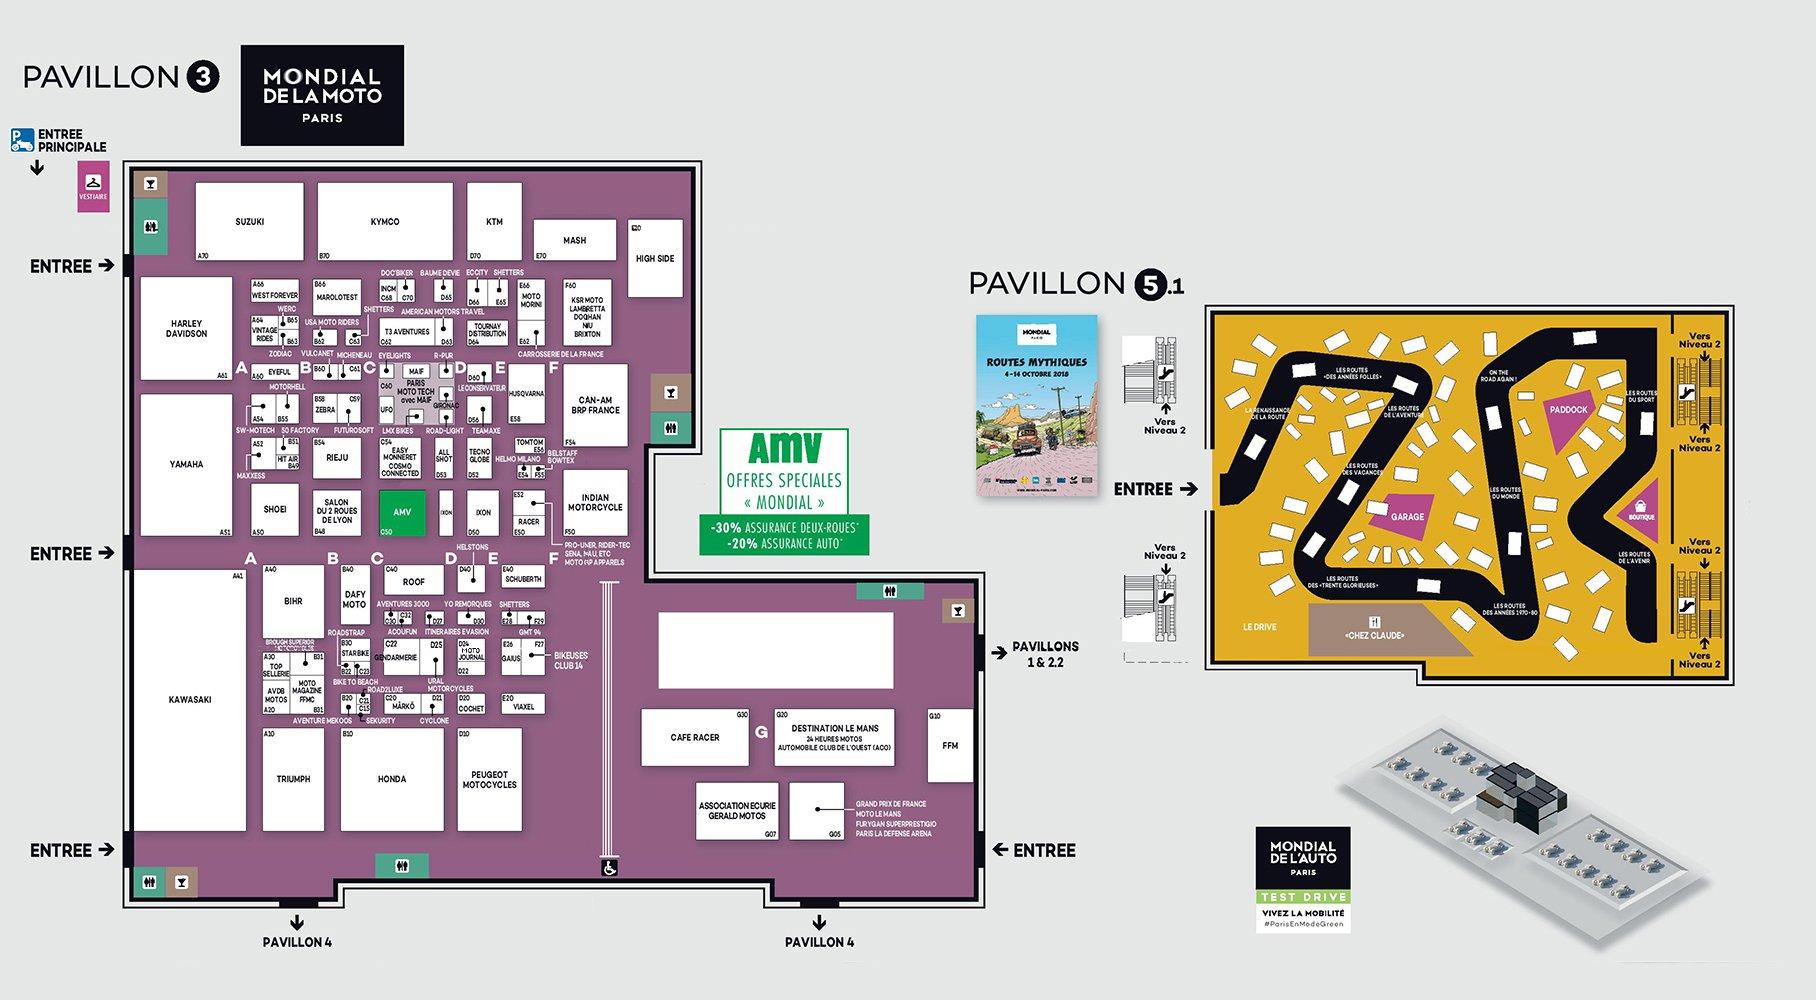 Mondial Paris 2018 - plan - Pavillon 3 - Mondial Moto - Pavillon 5 - Expo Routes Mythiques